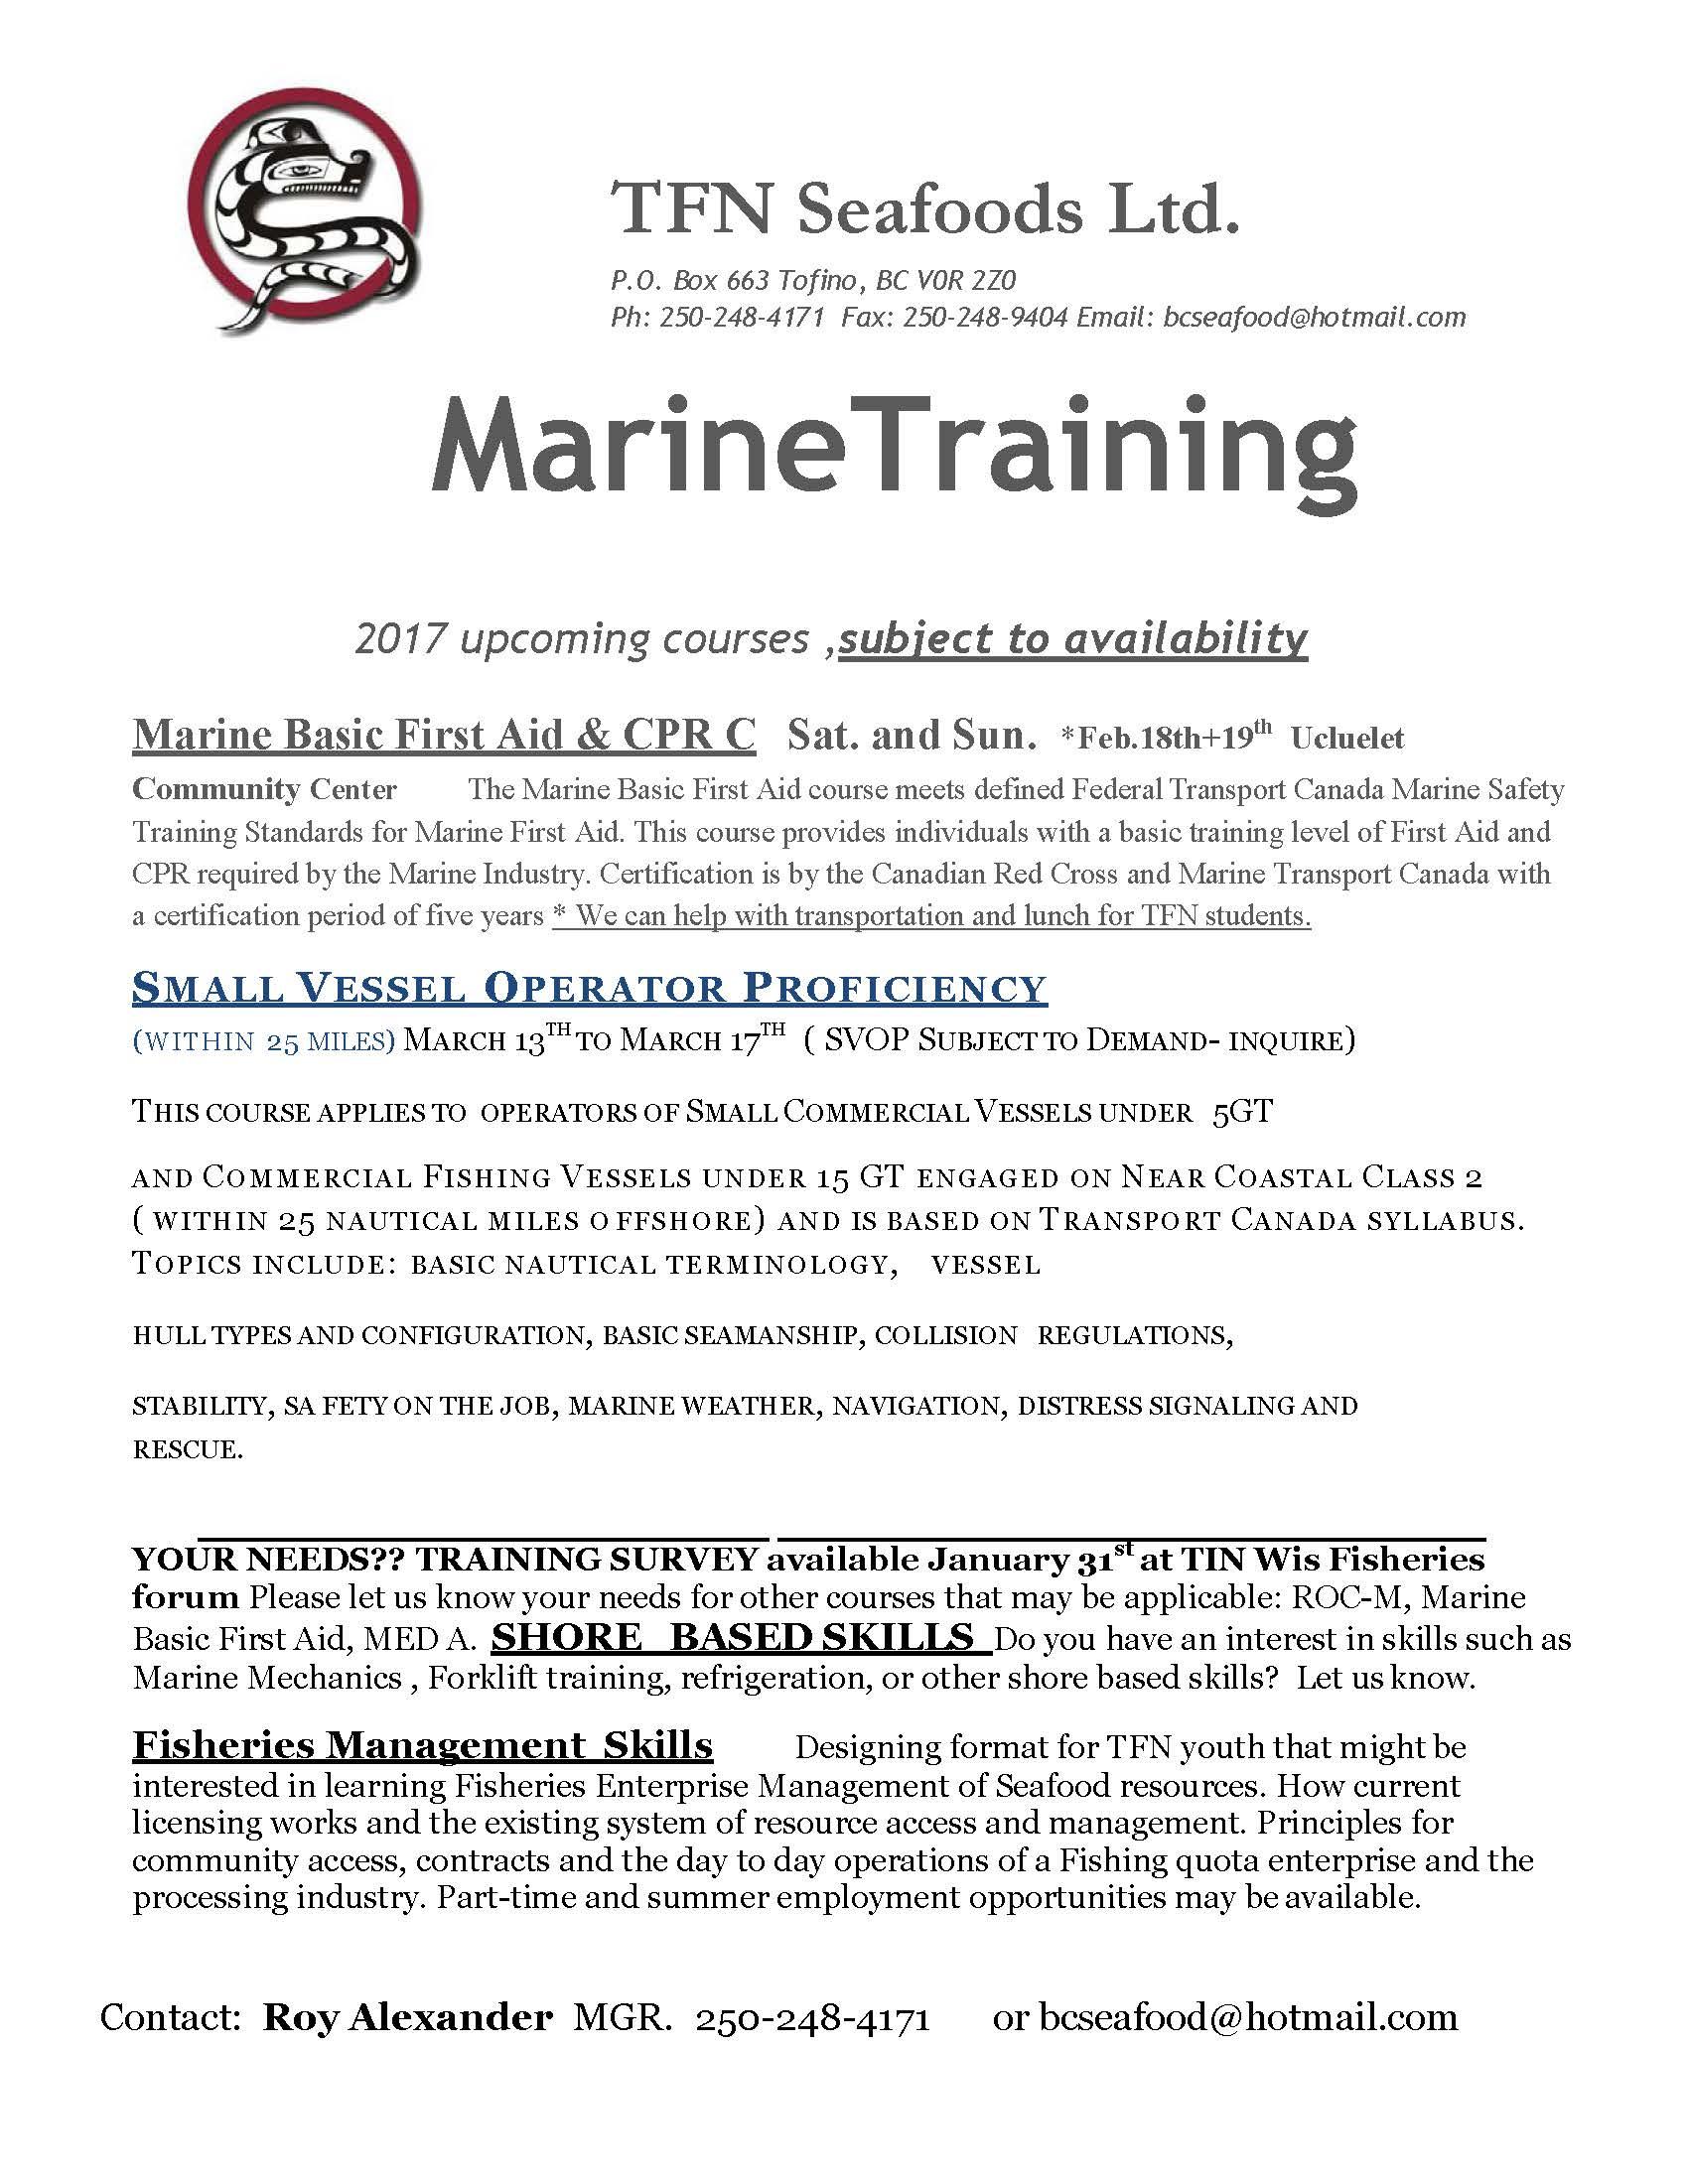 TFN Bulletin Feb1-2017_Page_15.jpg